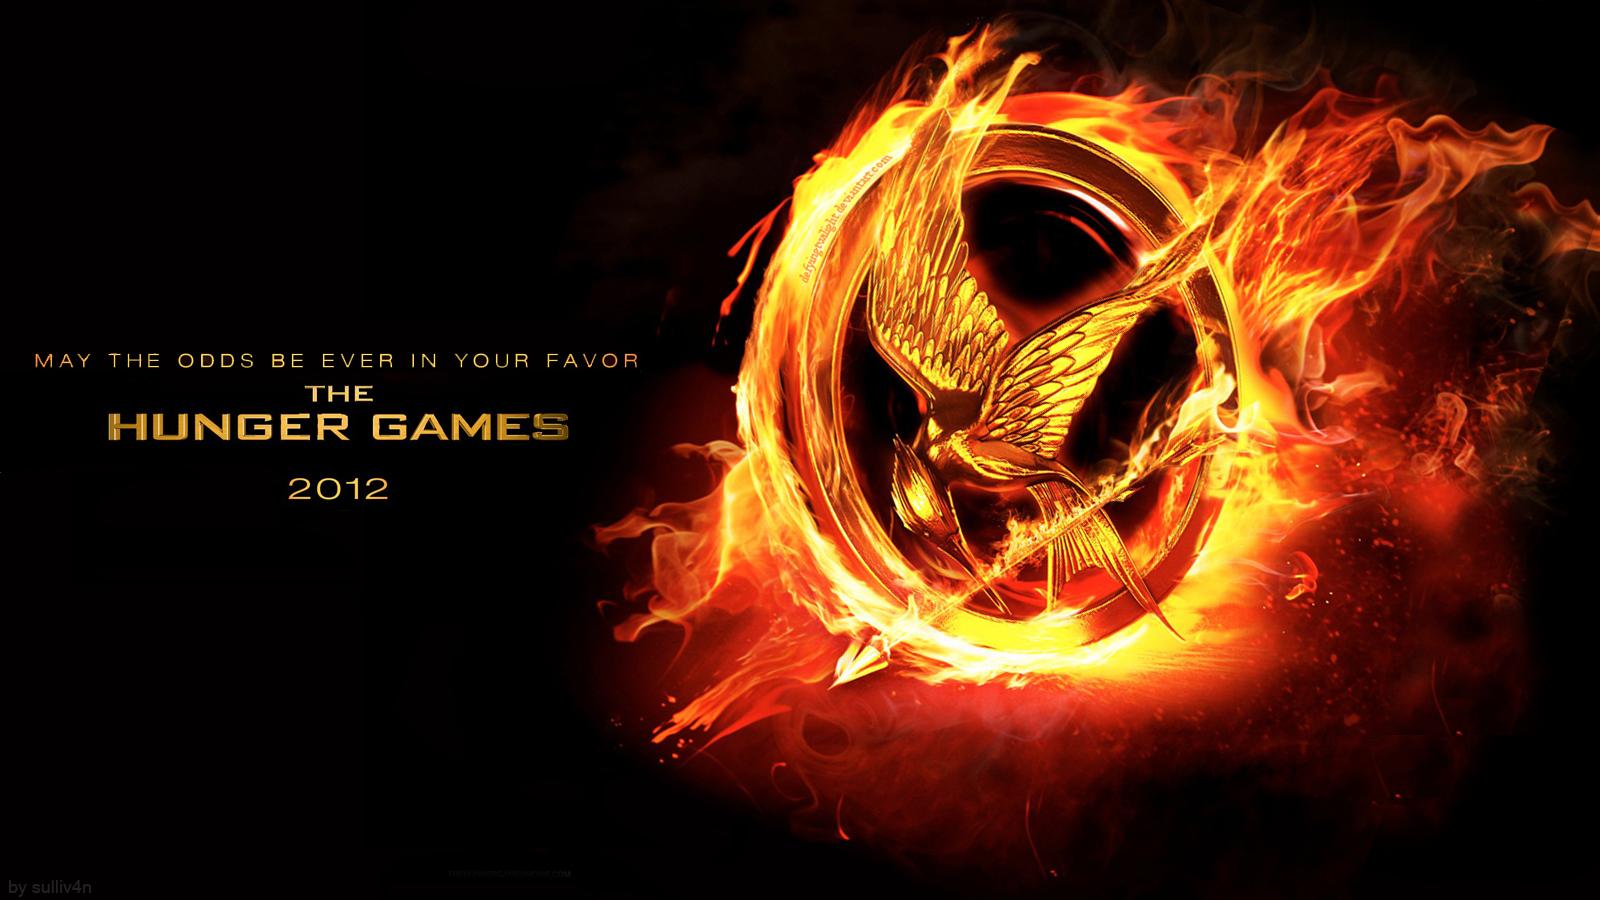 The Hunger Games Wallpaper the hunger games 28393405 1600 900jpg 1600x900